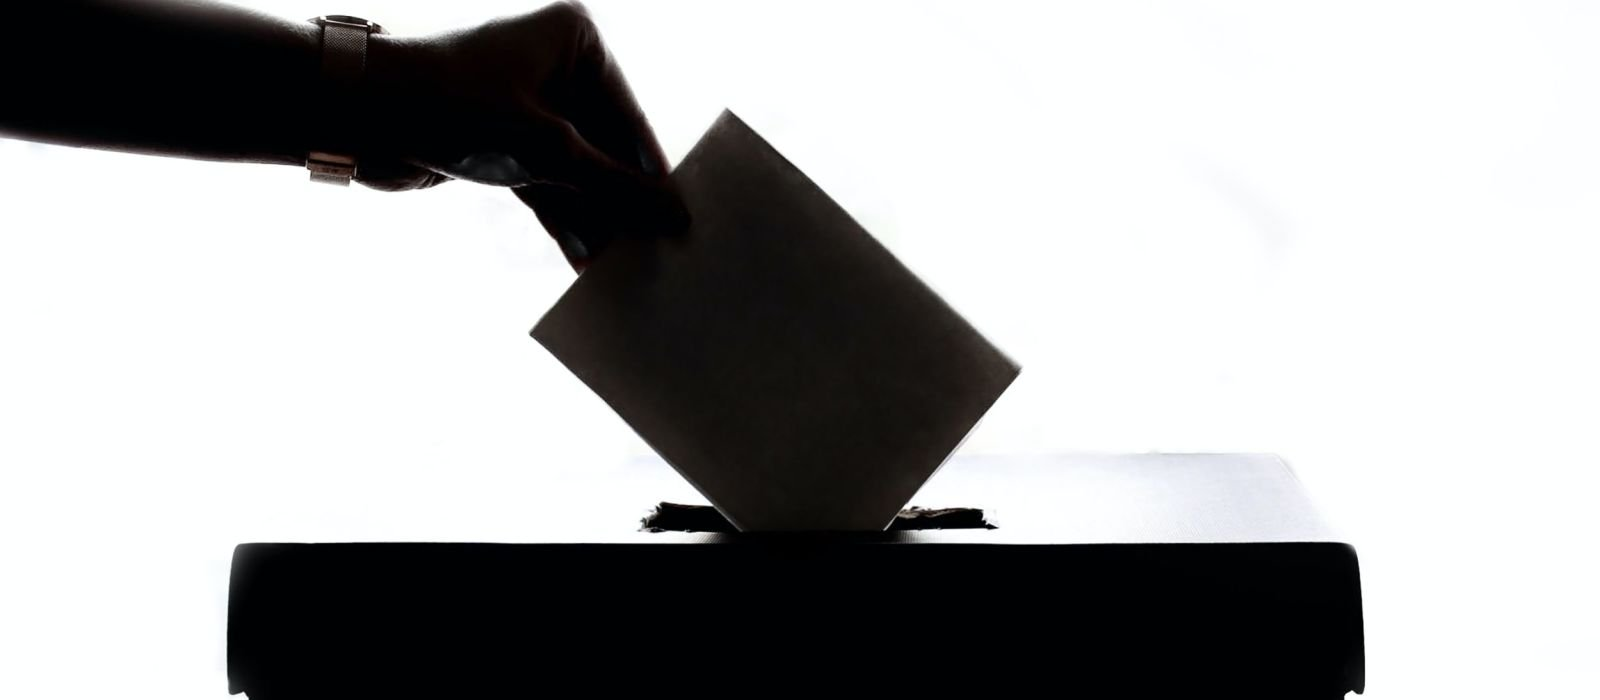 Women Voters, Fawcett society event